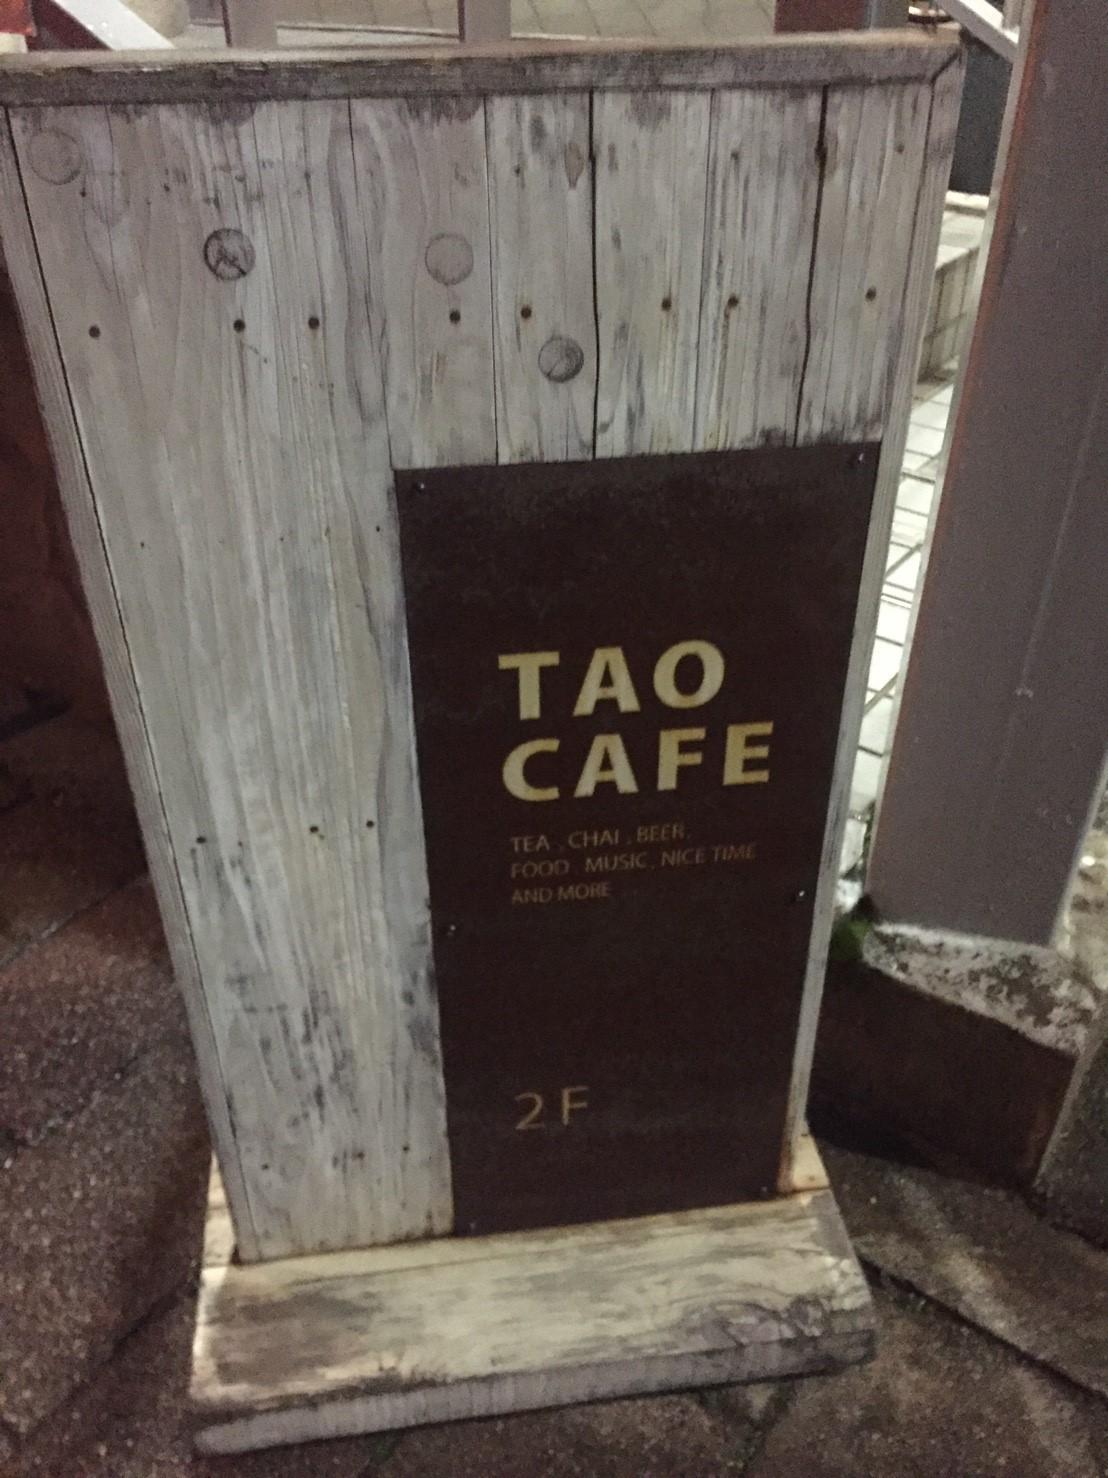 TAO CAFE にて夕食_e0115904_23454393.jpg